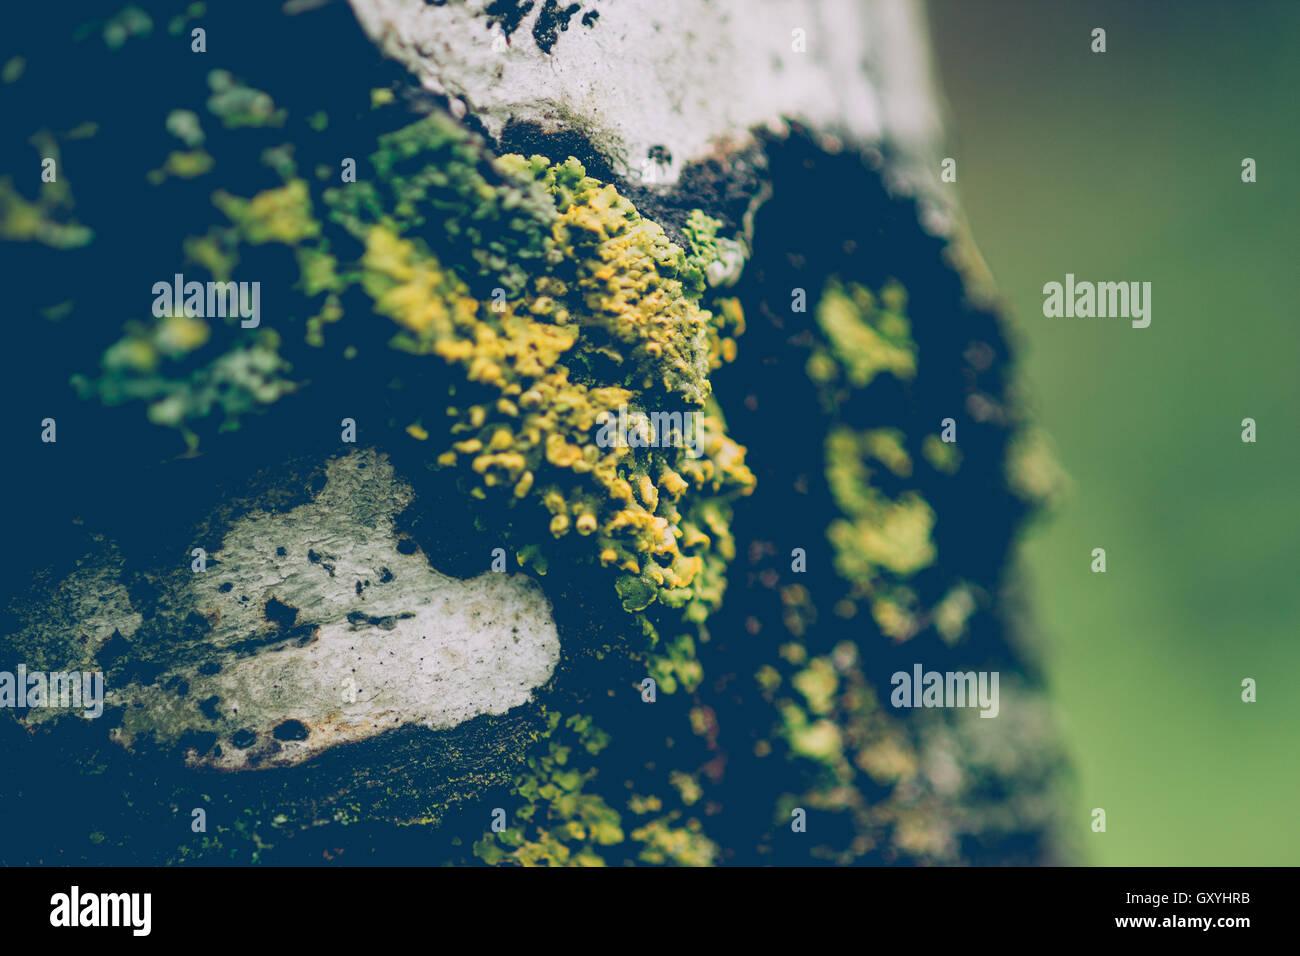 Moss on Aspen - Stock Image